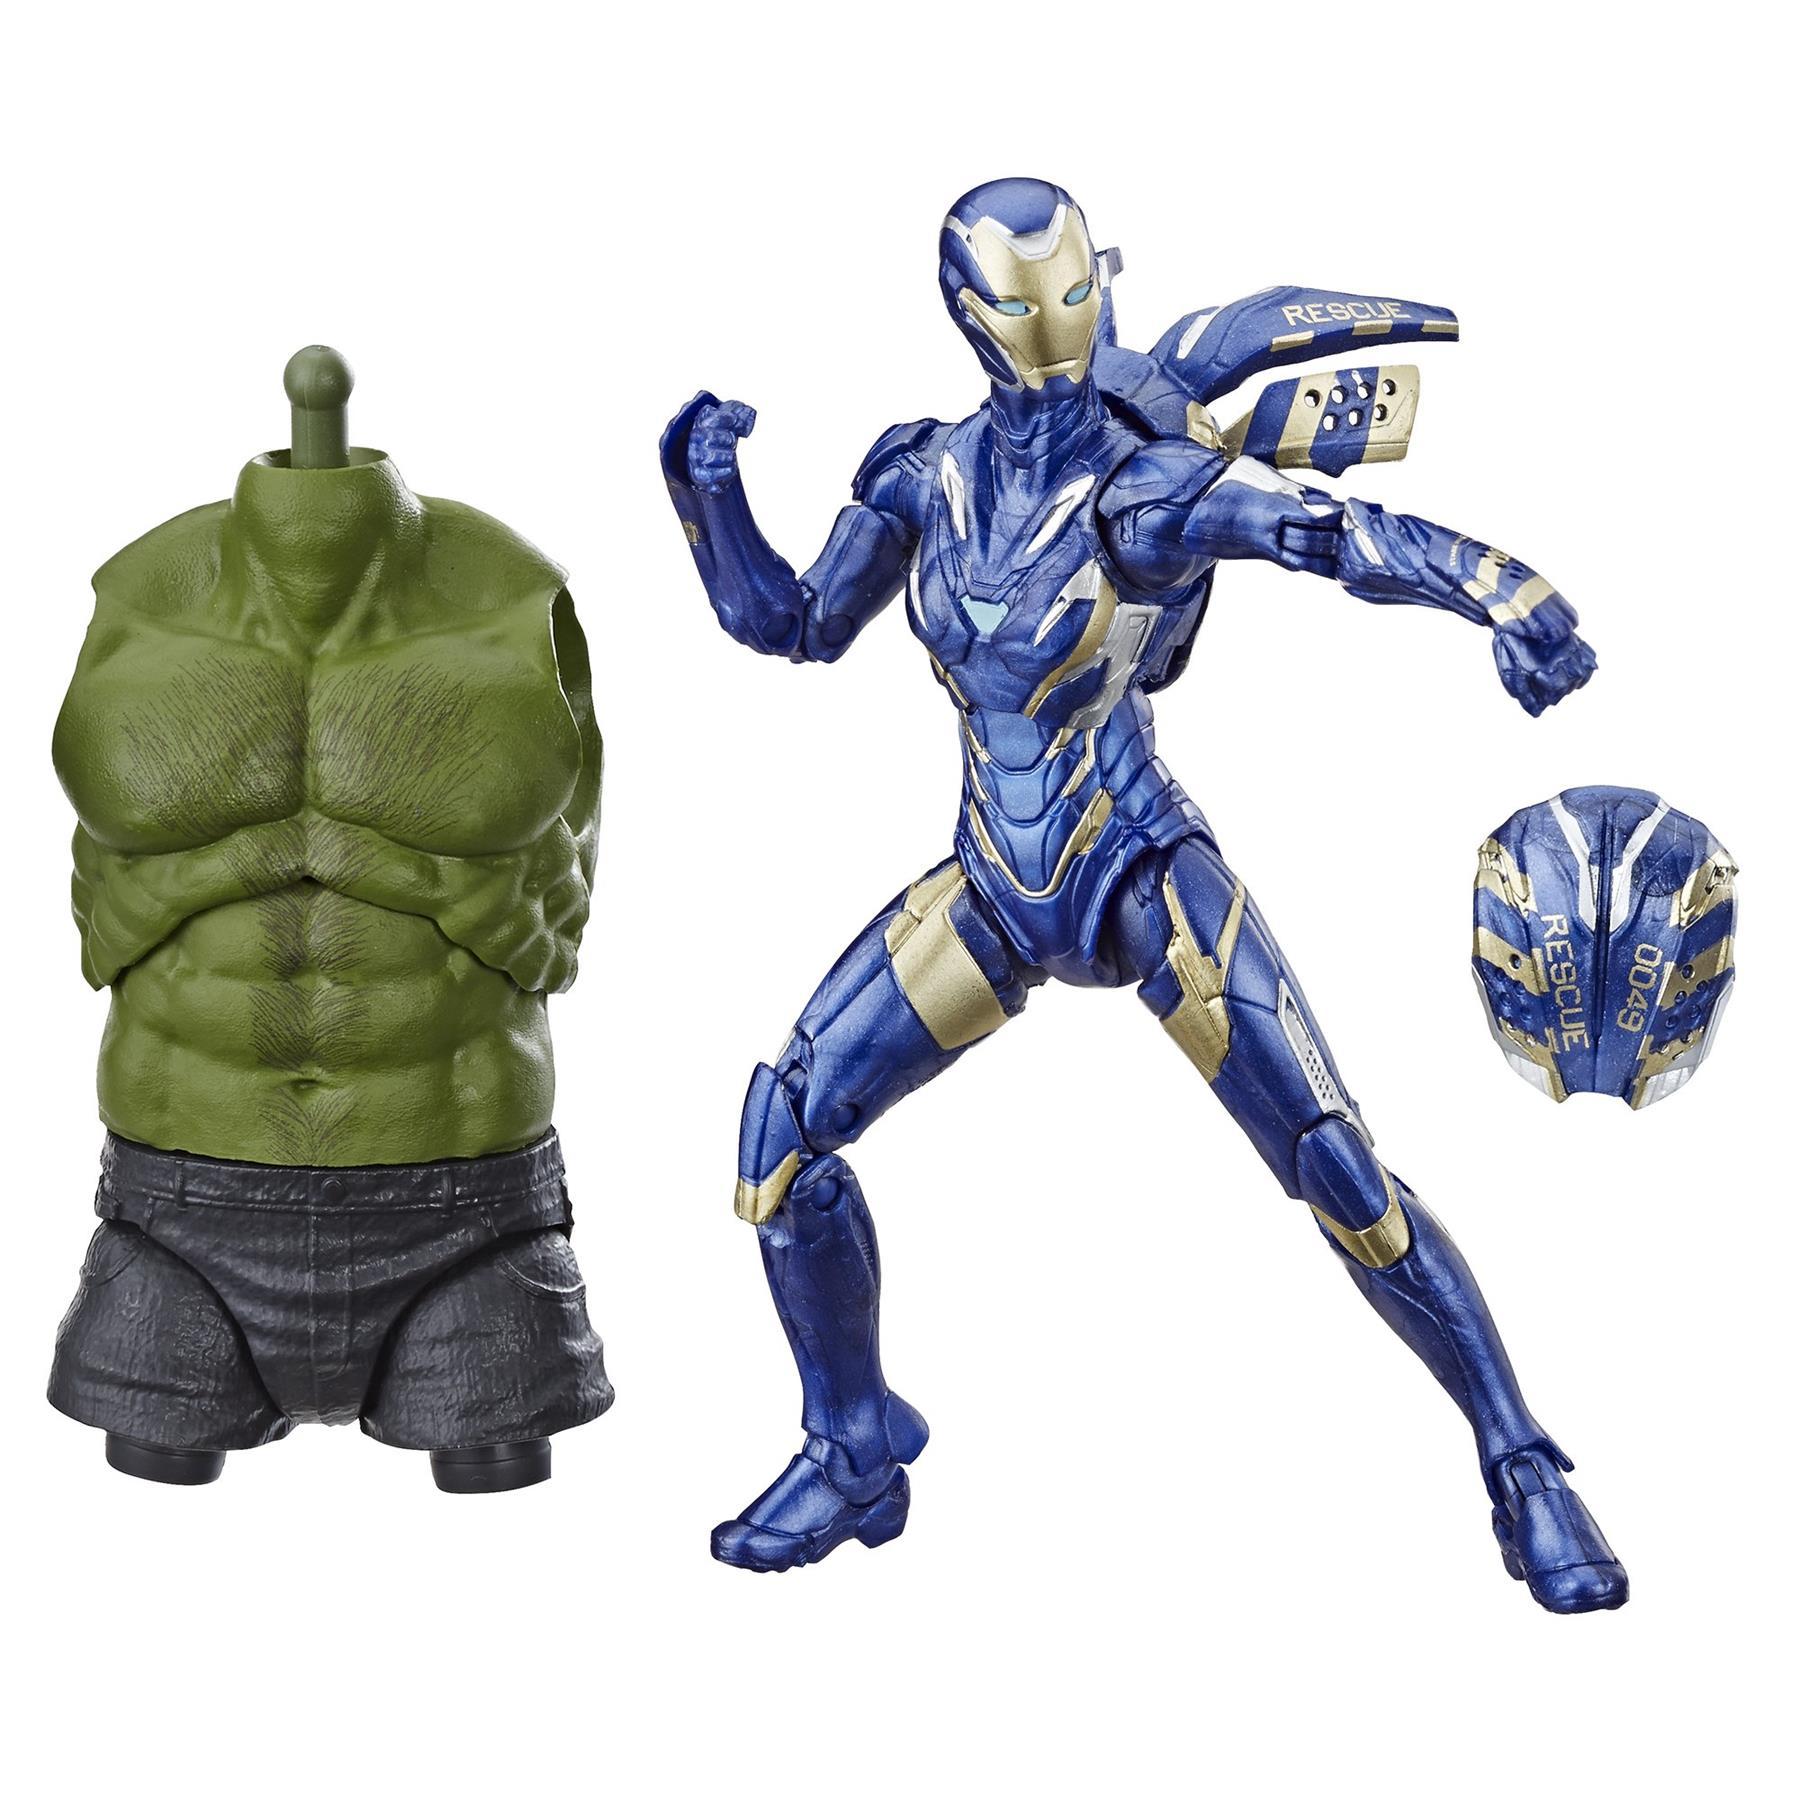 Marvel-Legends-Avengers-6-034-Action-Figures-Hulk-BAF thumbnail 7